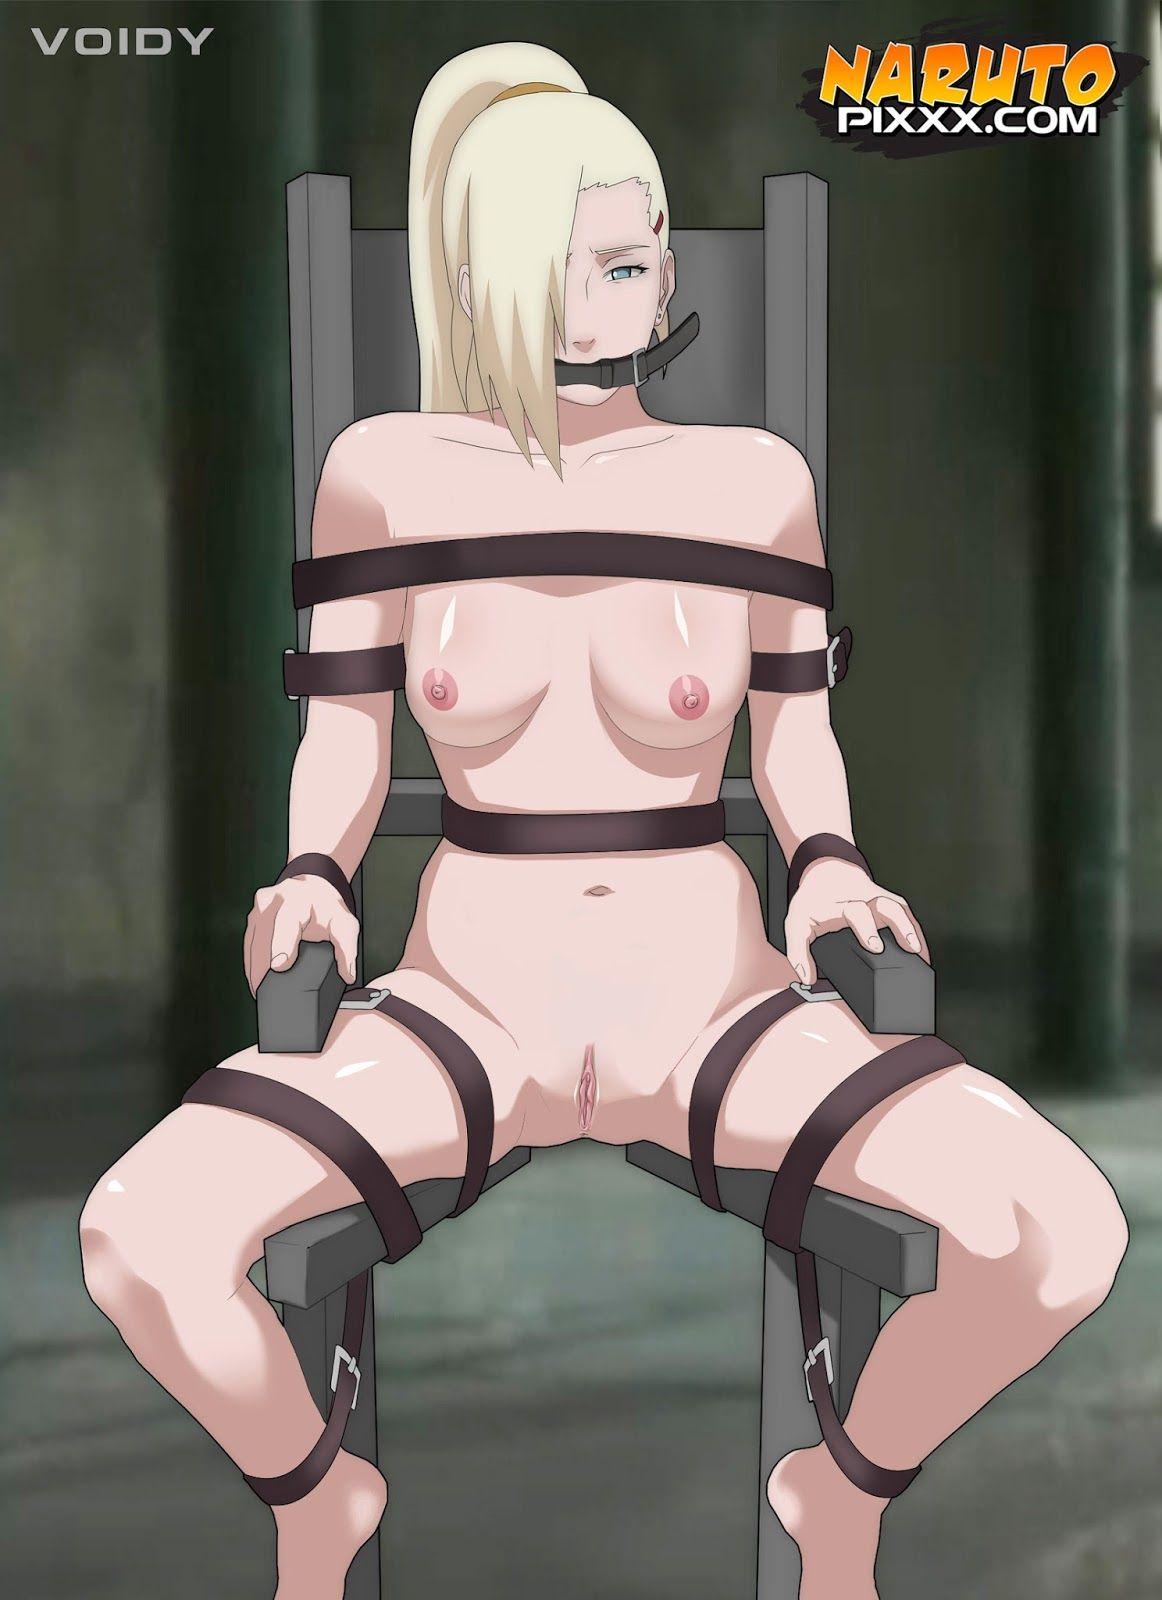 Naruto hentai pics without a membership